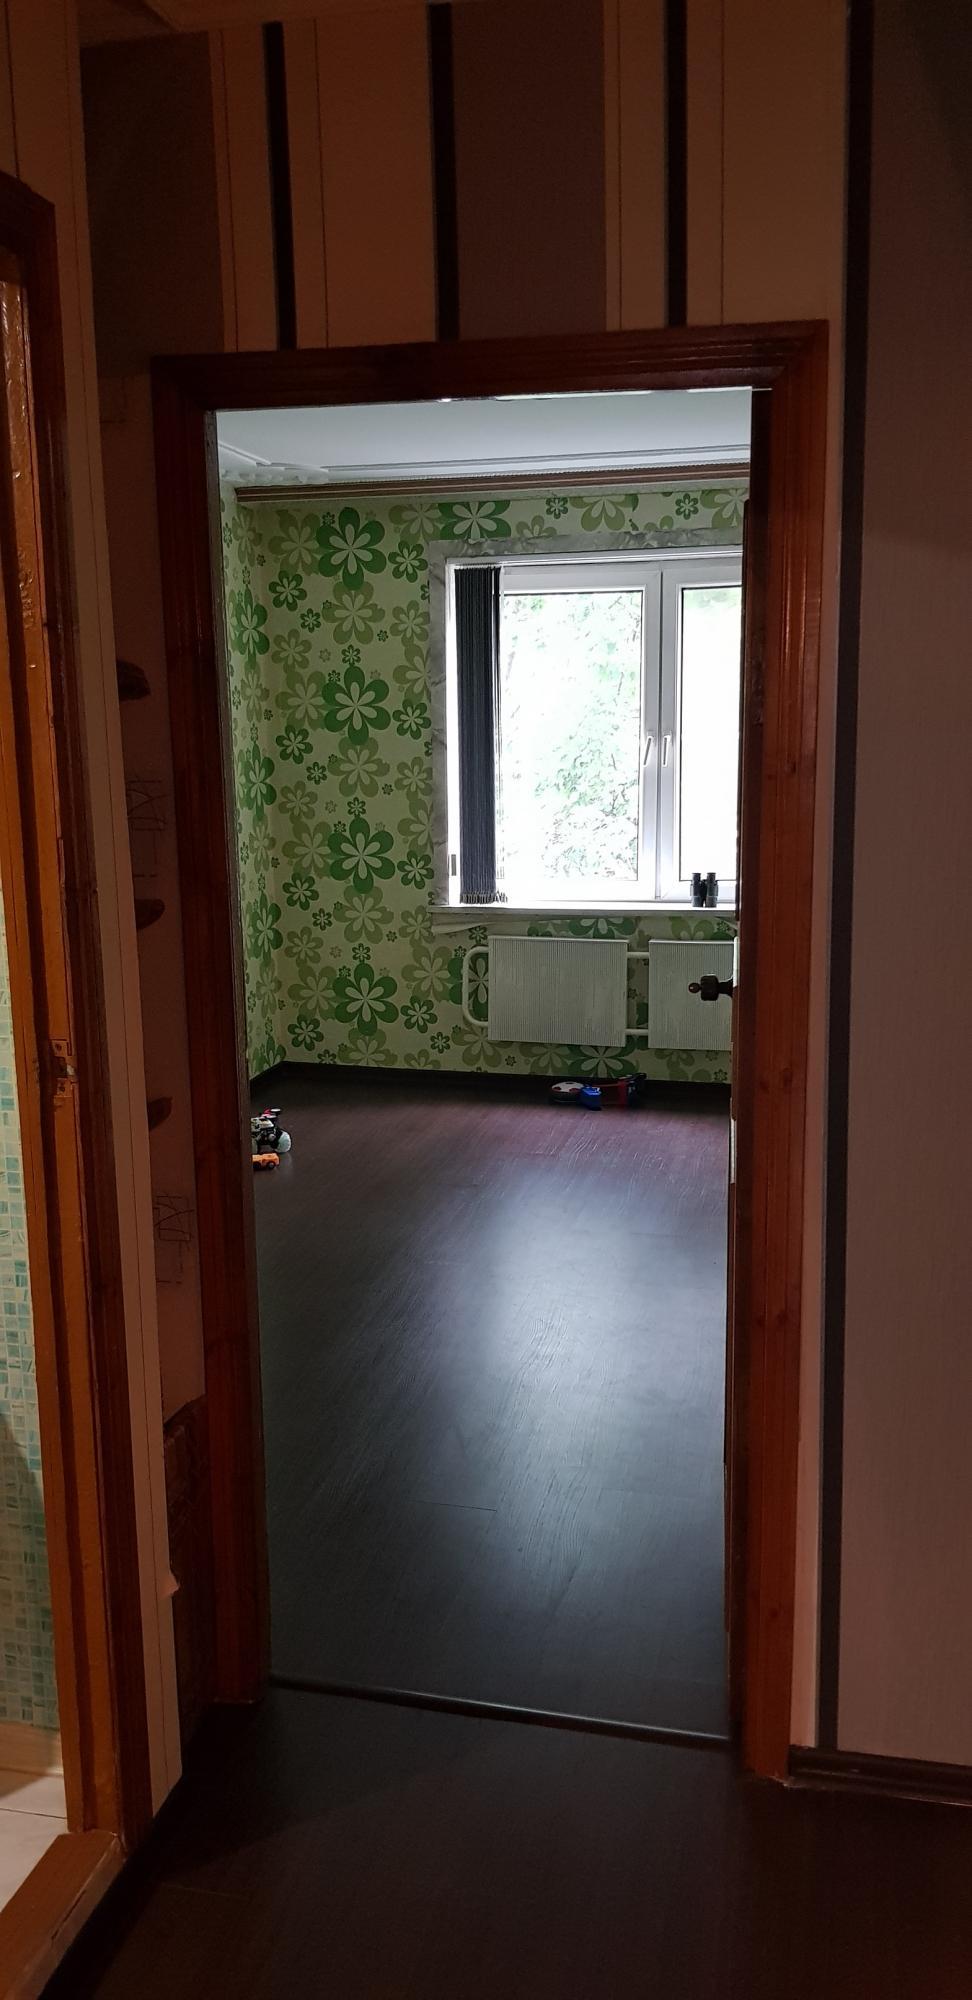 Аренда 3-комнатной квартиры, г. Тольятти, 70 лет Октября улица  дом 39